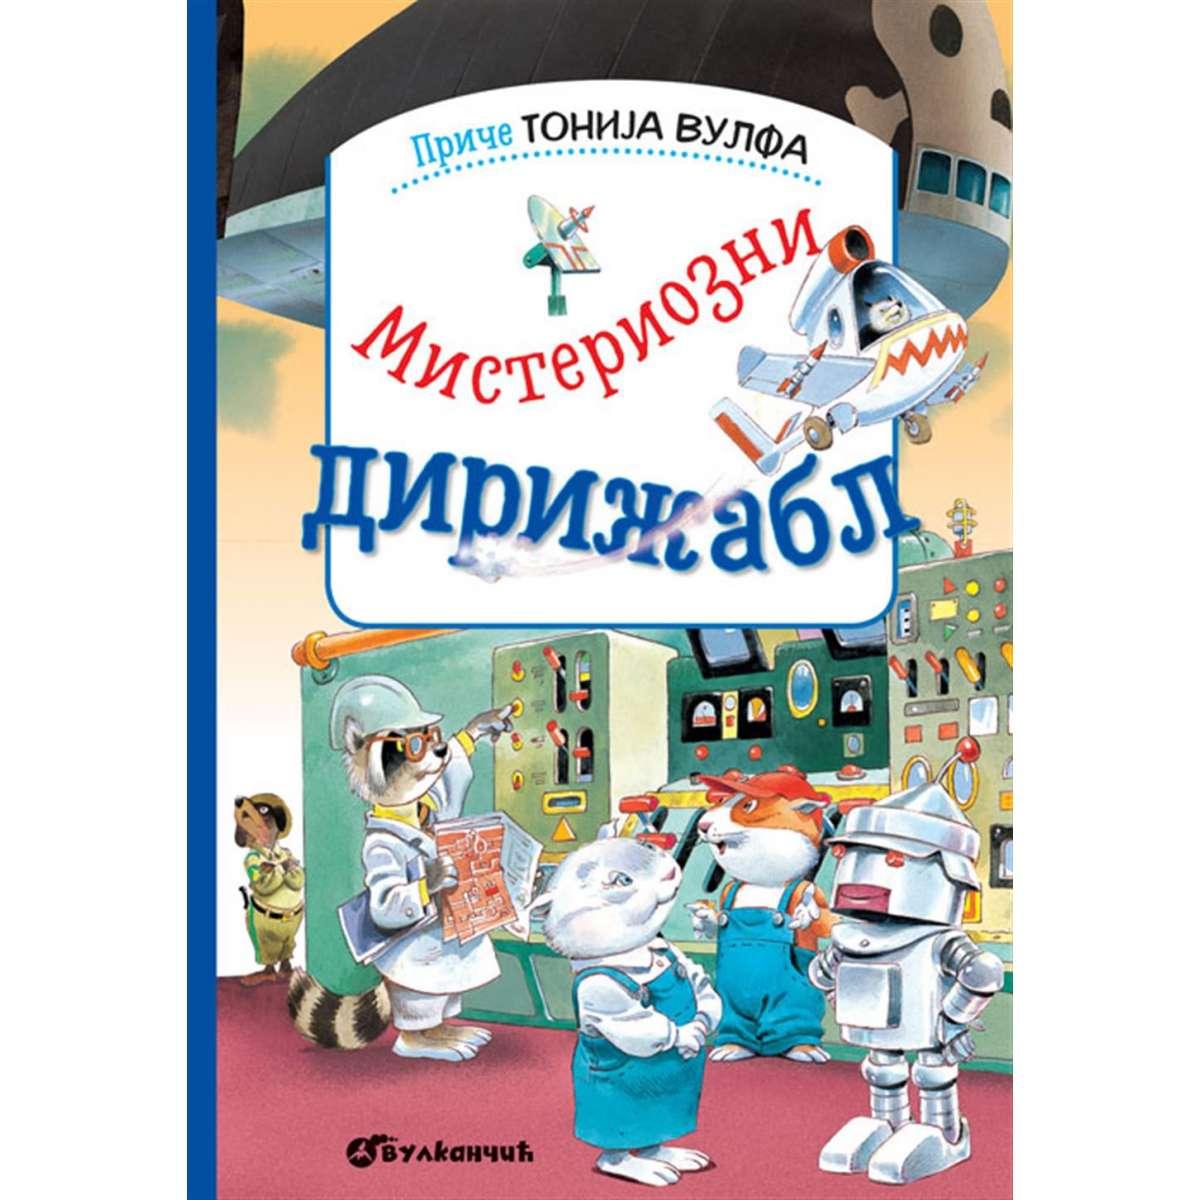 Priče Tonija Vulfa: Misteriozni dirižabl